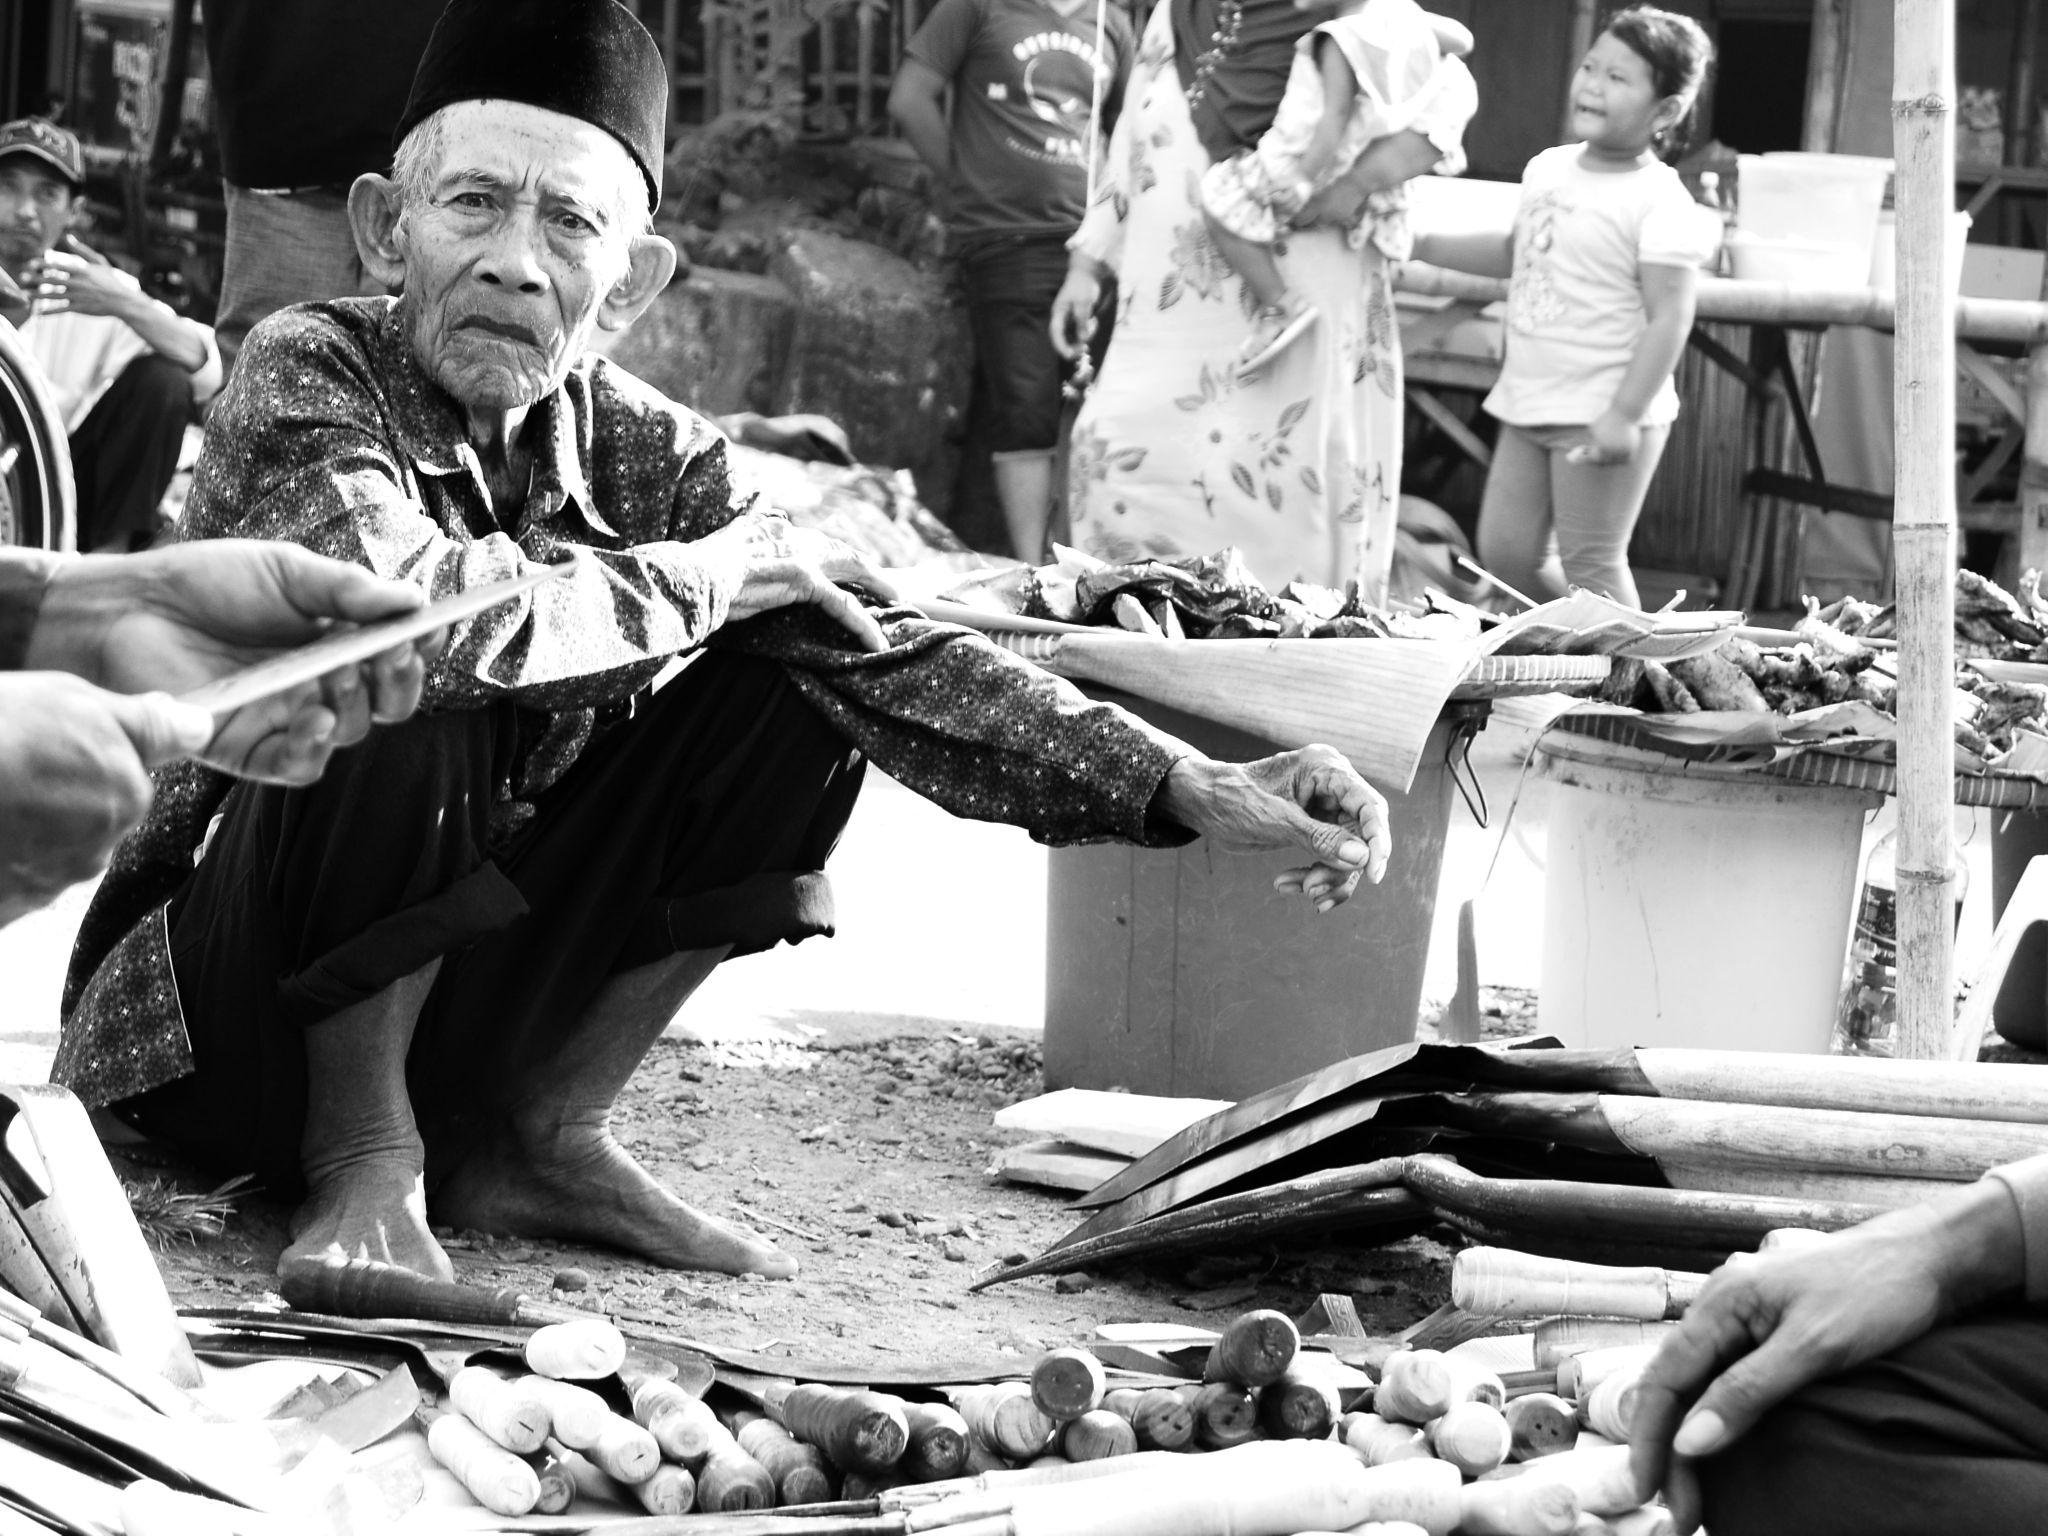 Old Man by Matt Sodrek